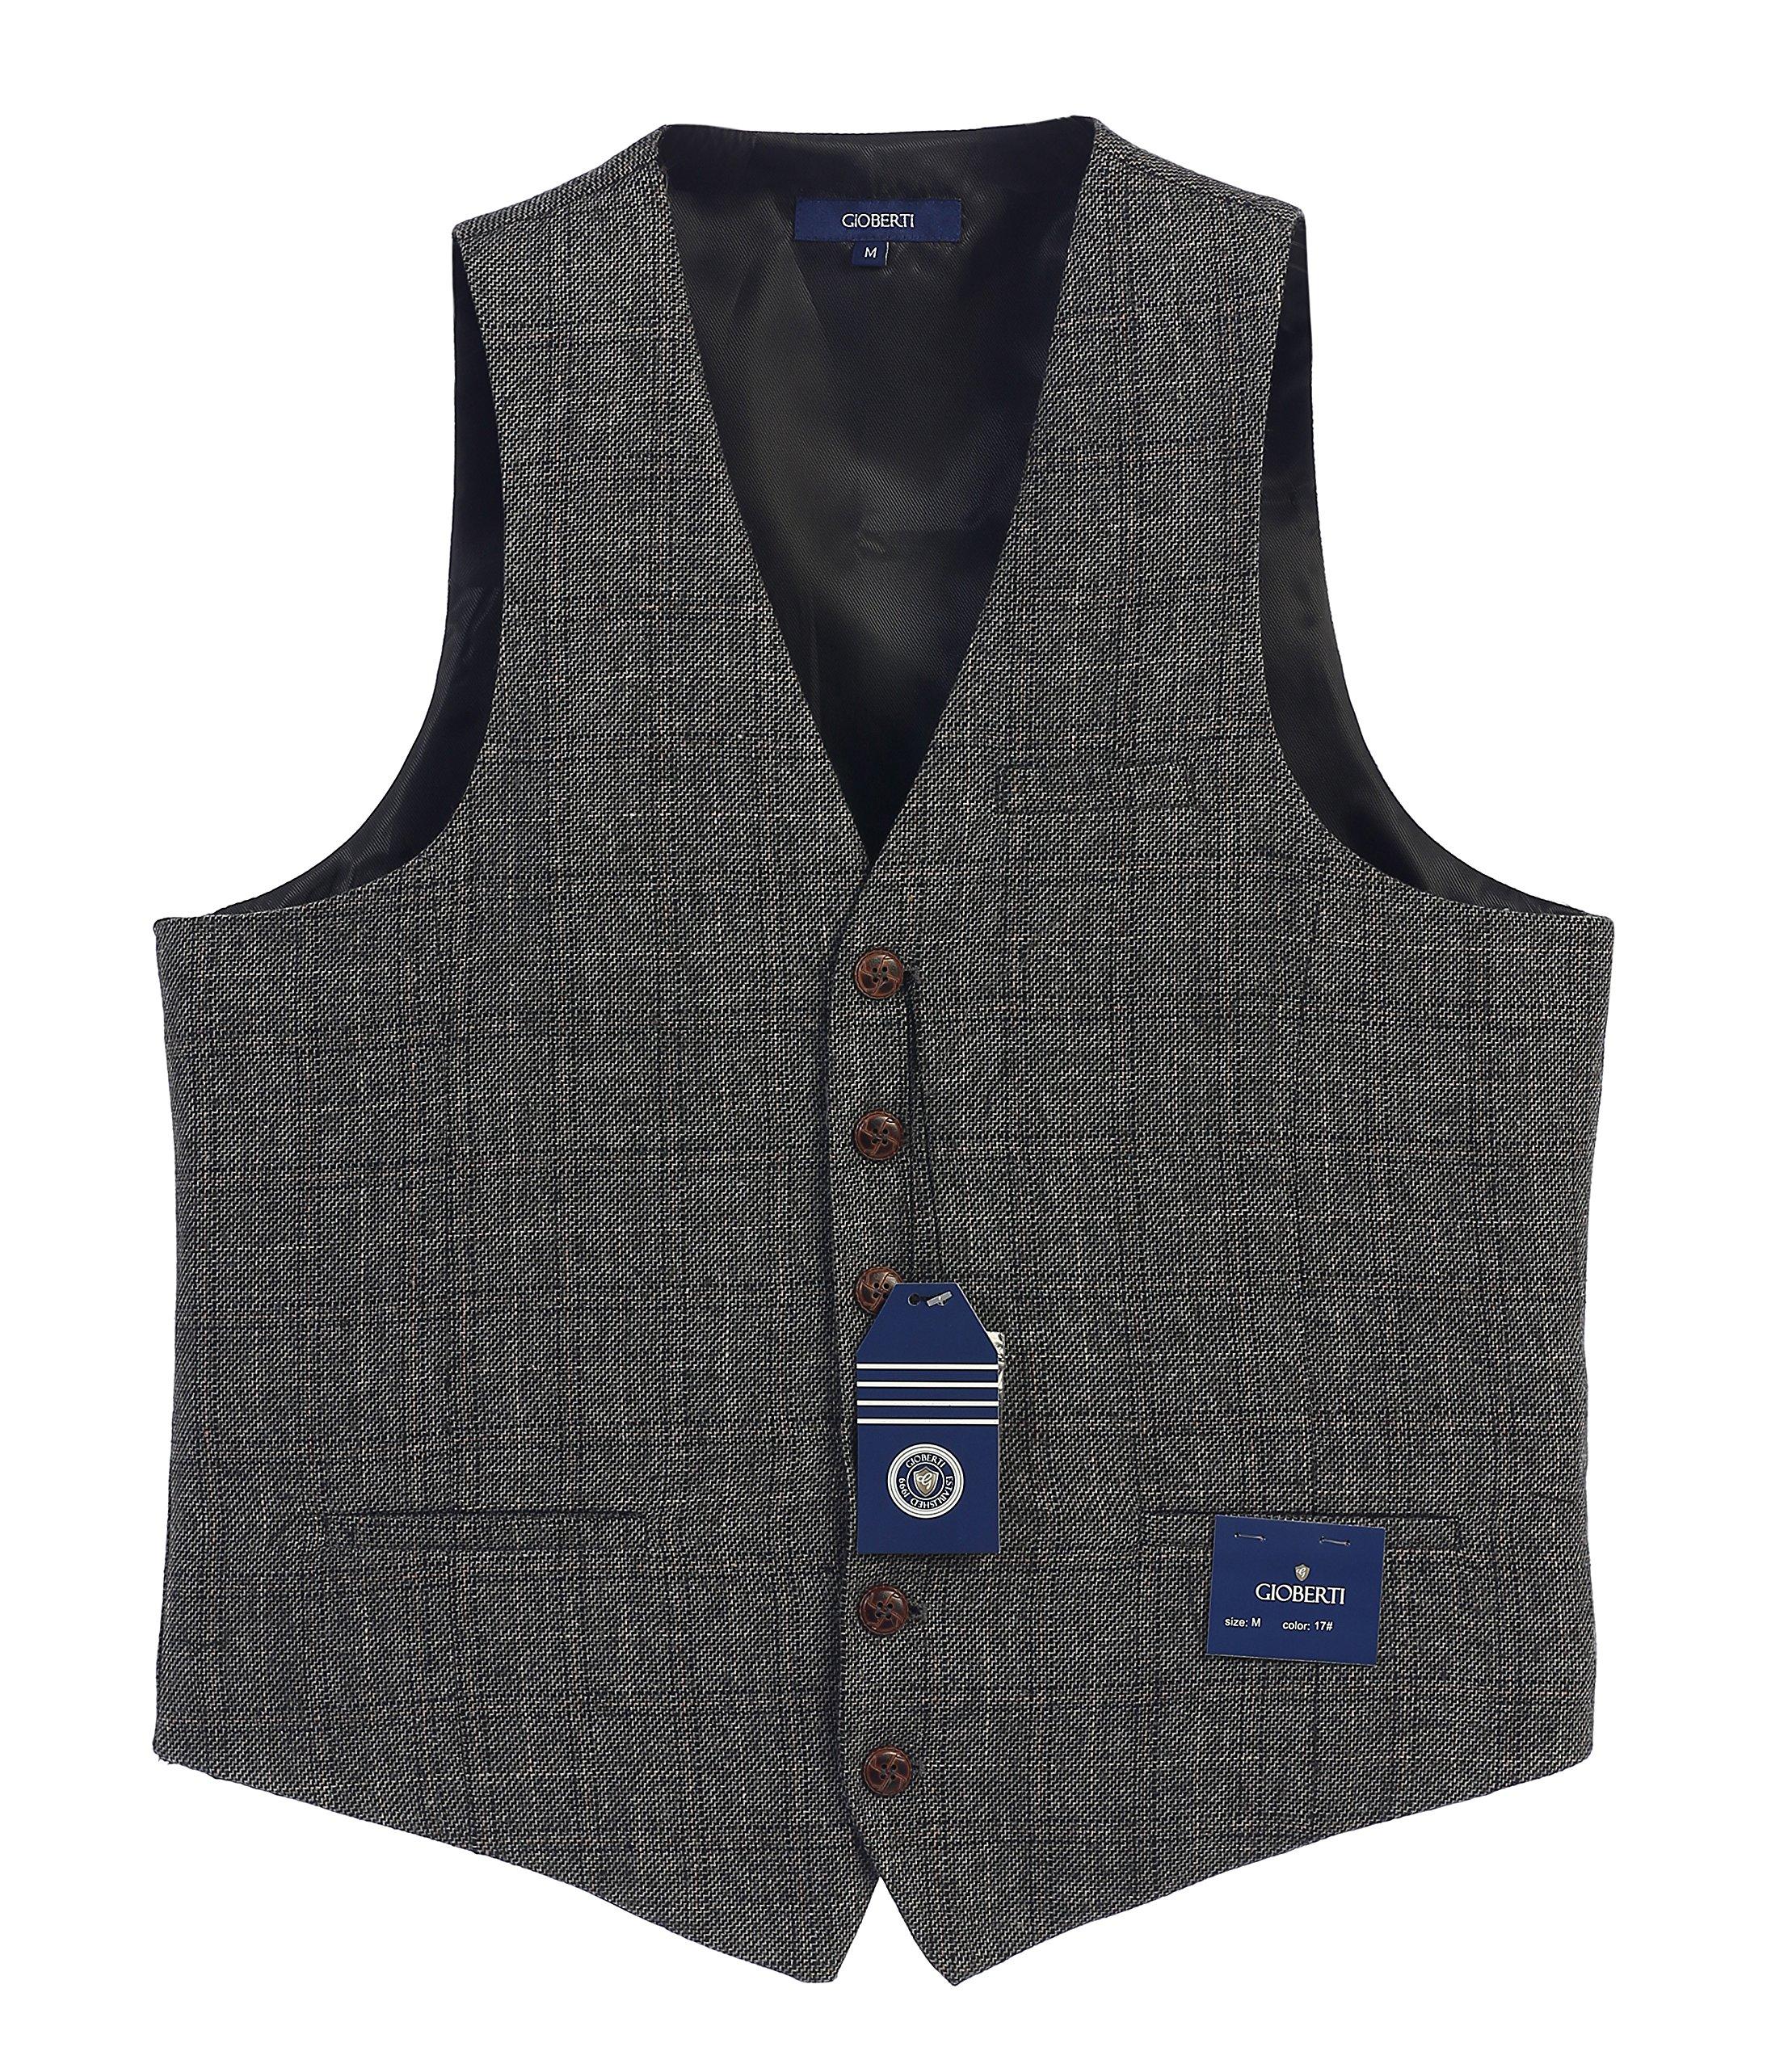 Gioberti Men's 6 Button Custom Formal Tweed Vest, Checked Charcoal/Tan, Small